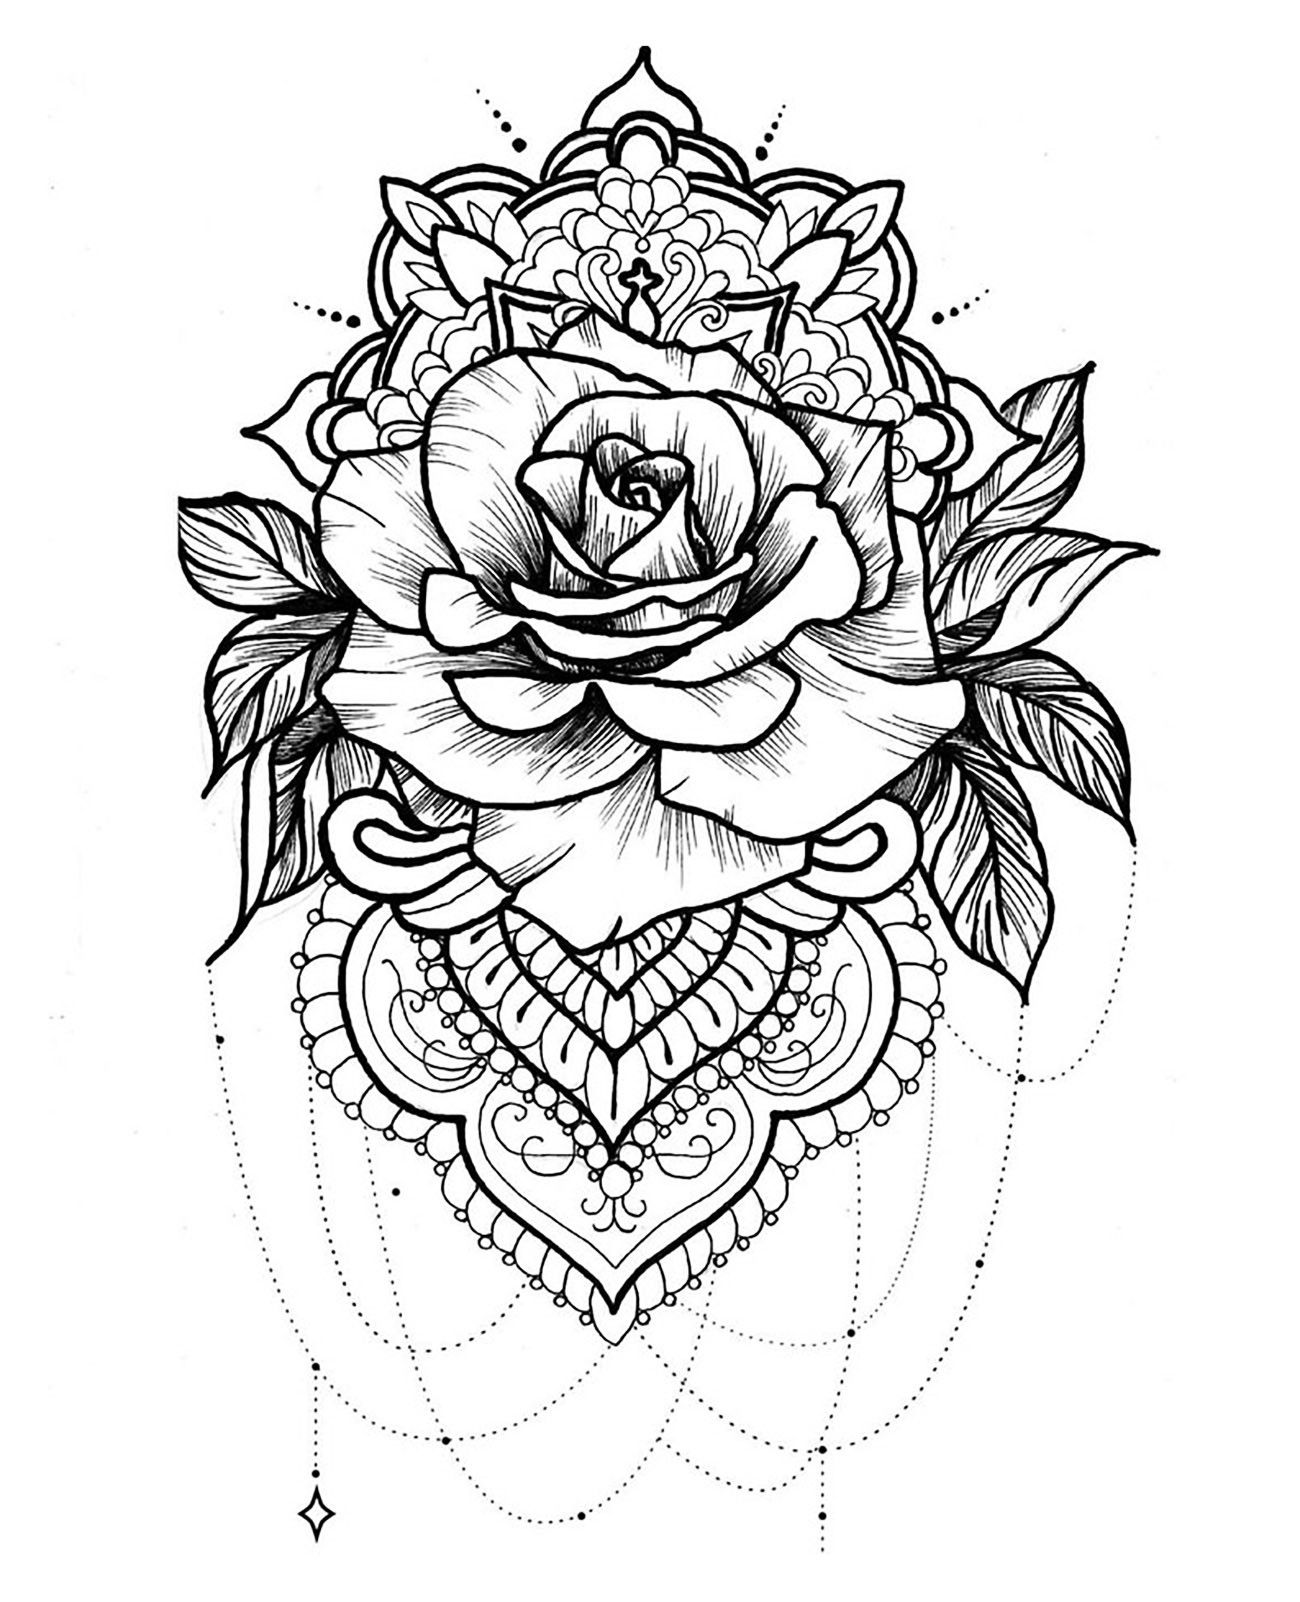 Coloriage Mandala Dragon Beau Modele Best Rose Mandala Coloring Pages Collection Tattoos Rose Tattoos Mandala Tattoo